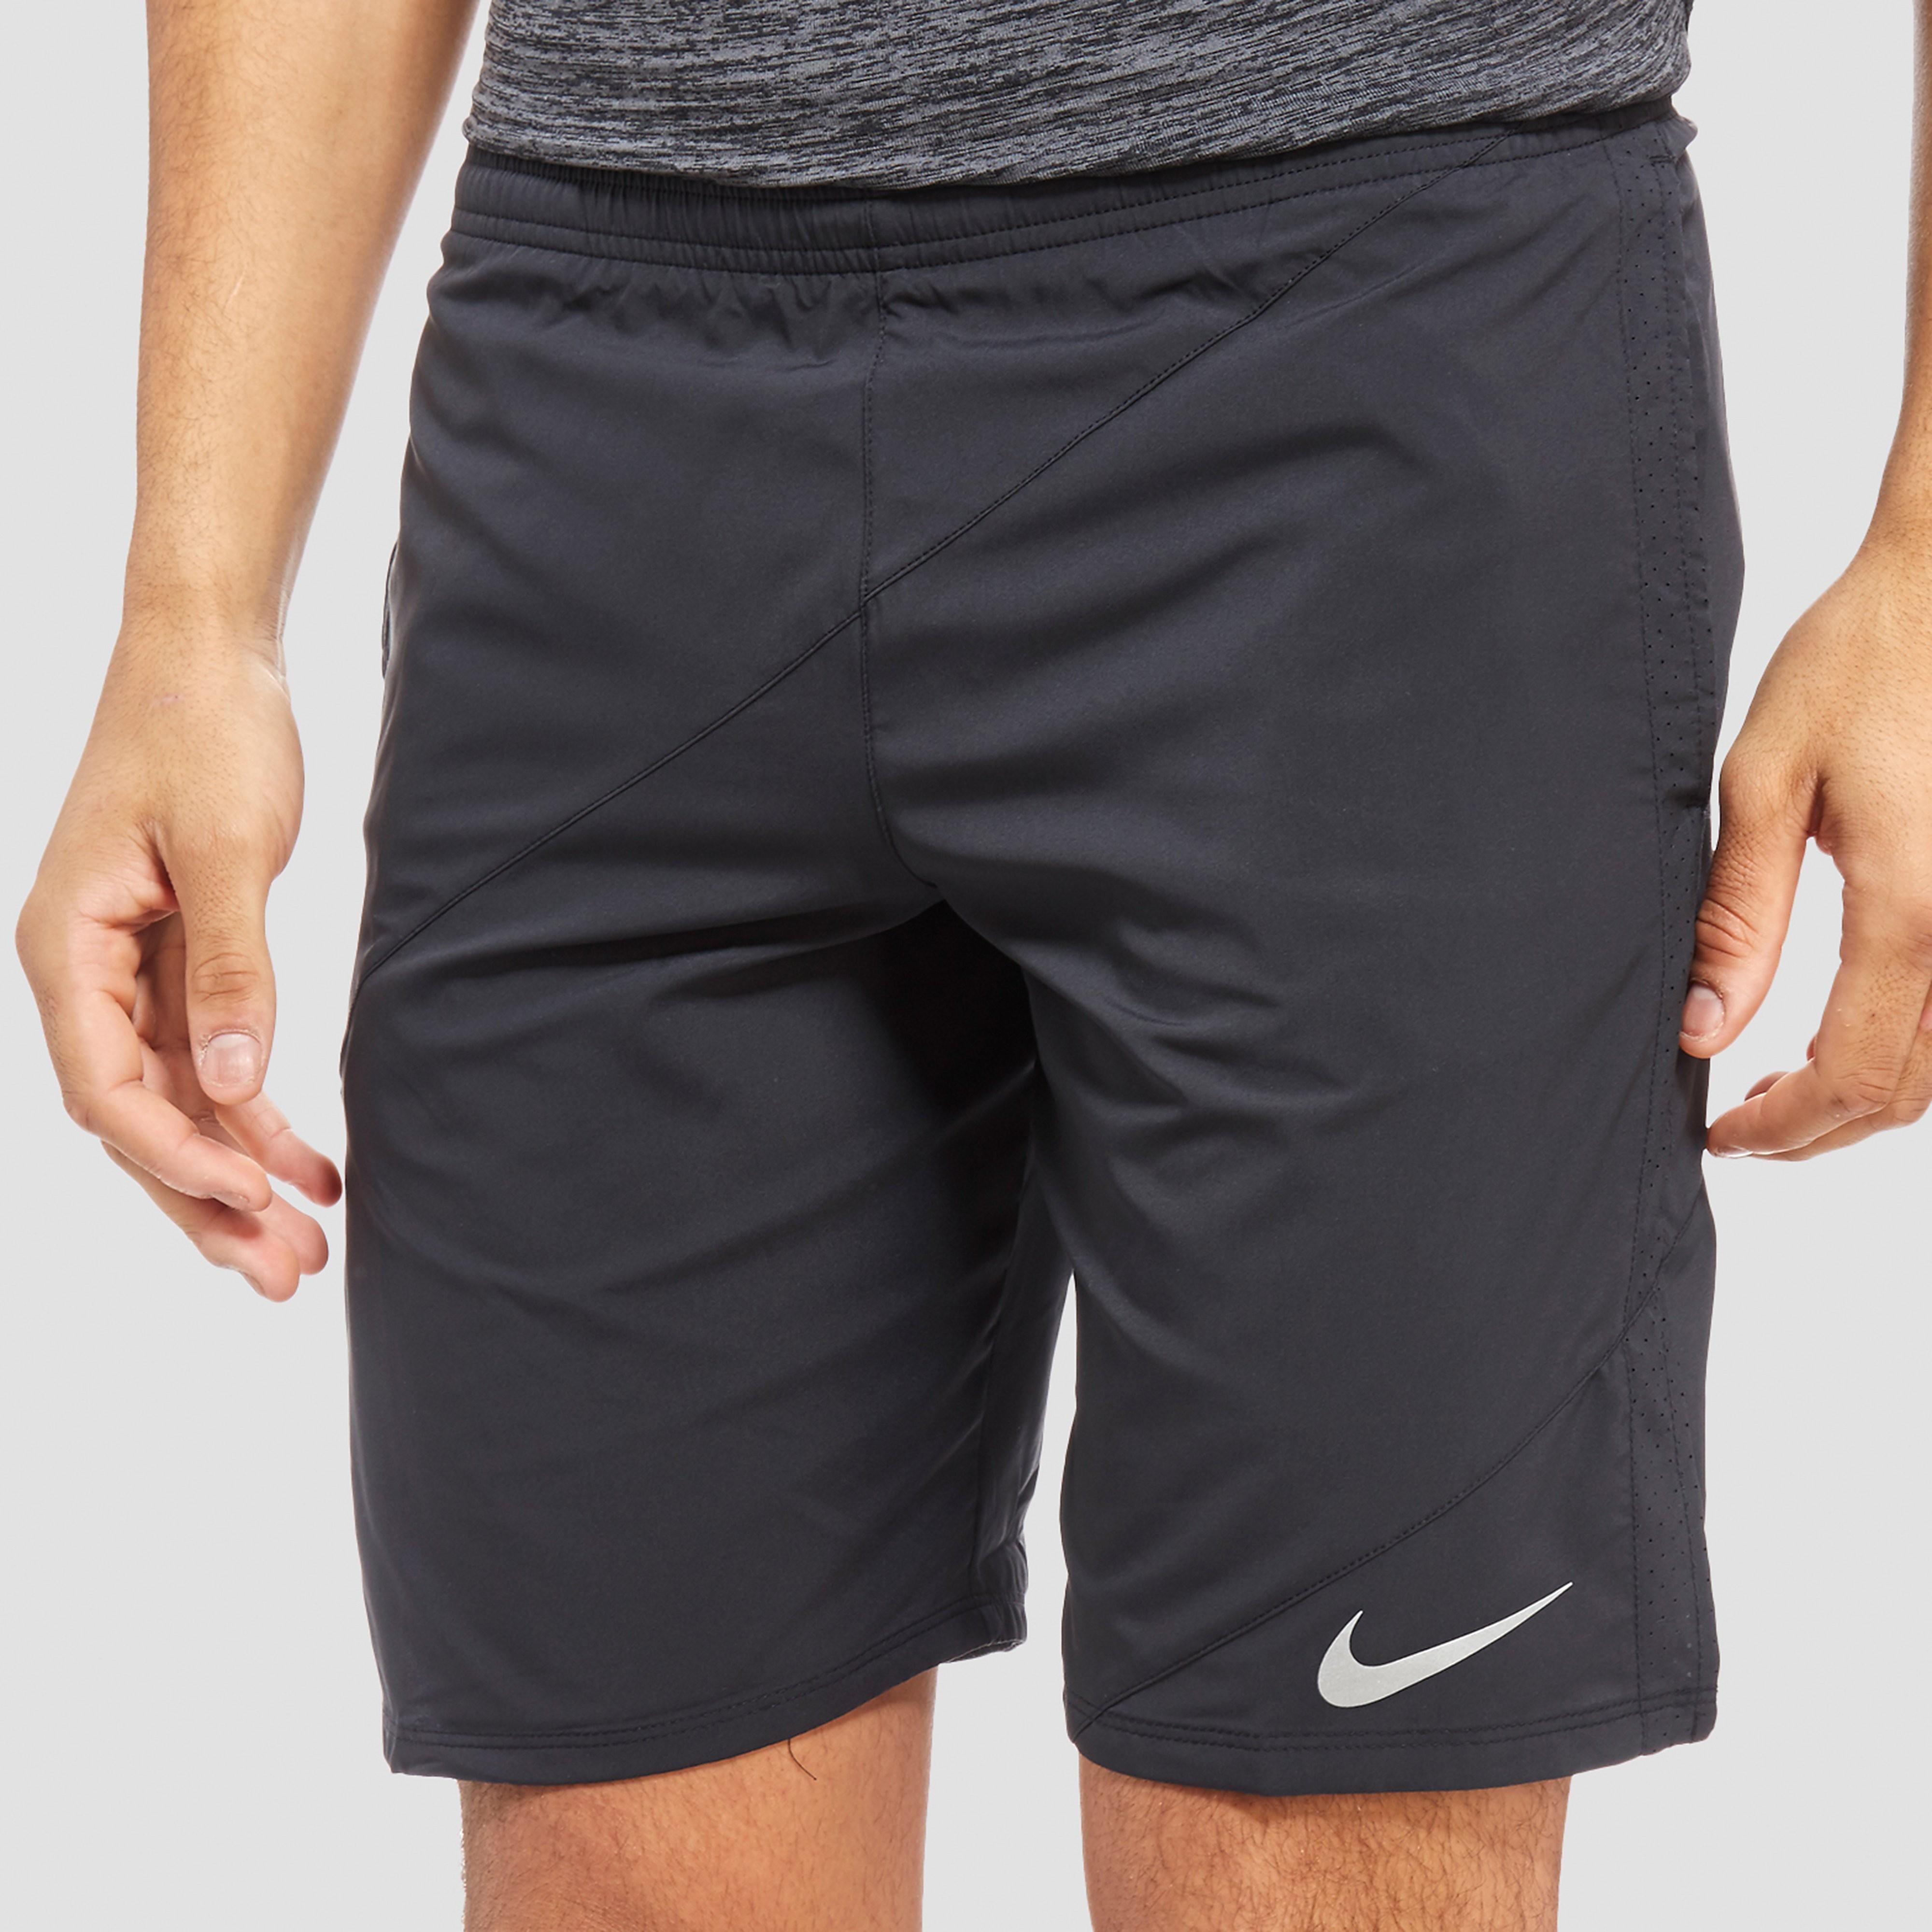 "Nike Distance 9"" Men's Running Shorts"